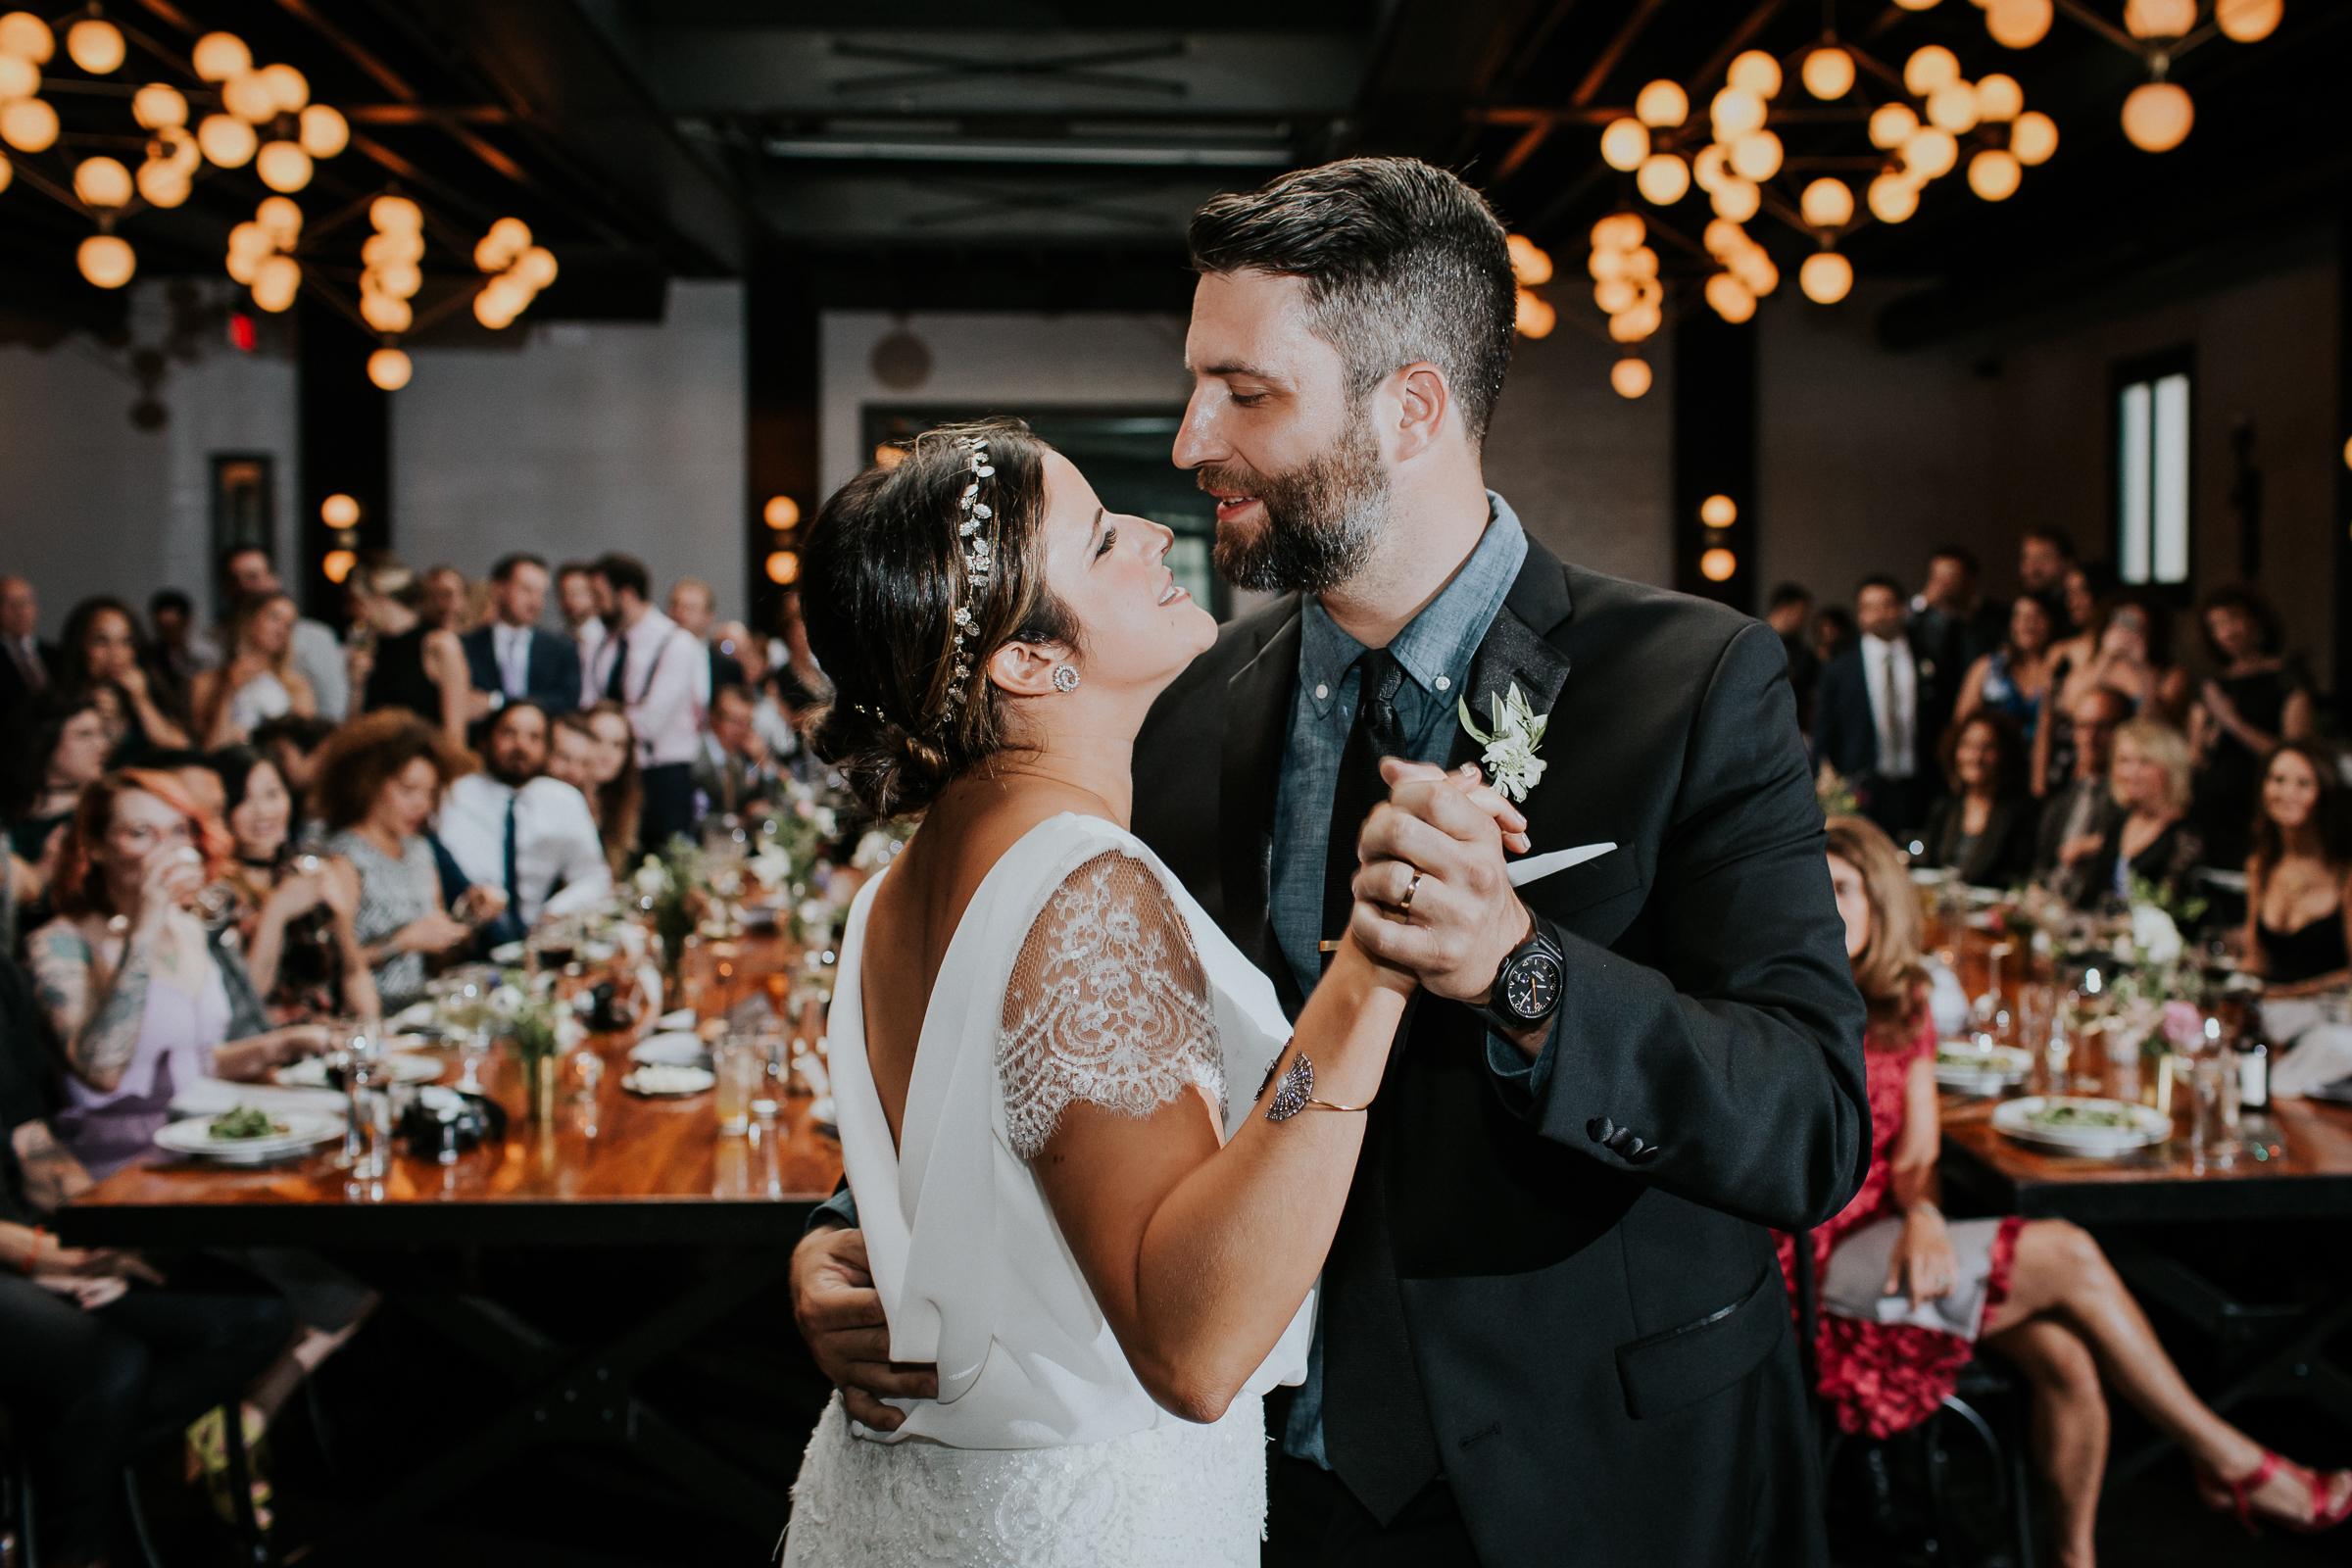 New-York-Documentary-Wedding-Photography-Best-Of-2017-by-Elvira-Kalviste-Photography-46.jpg